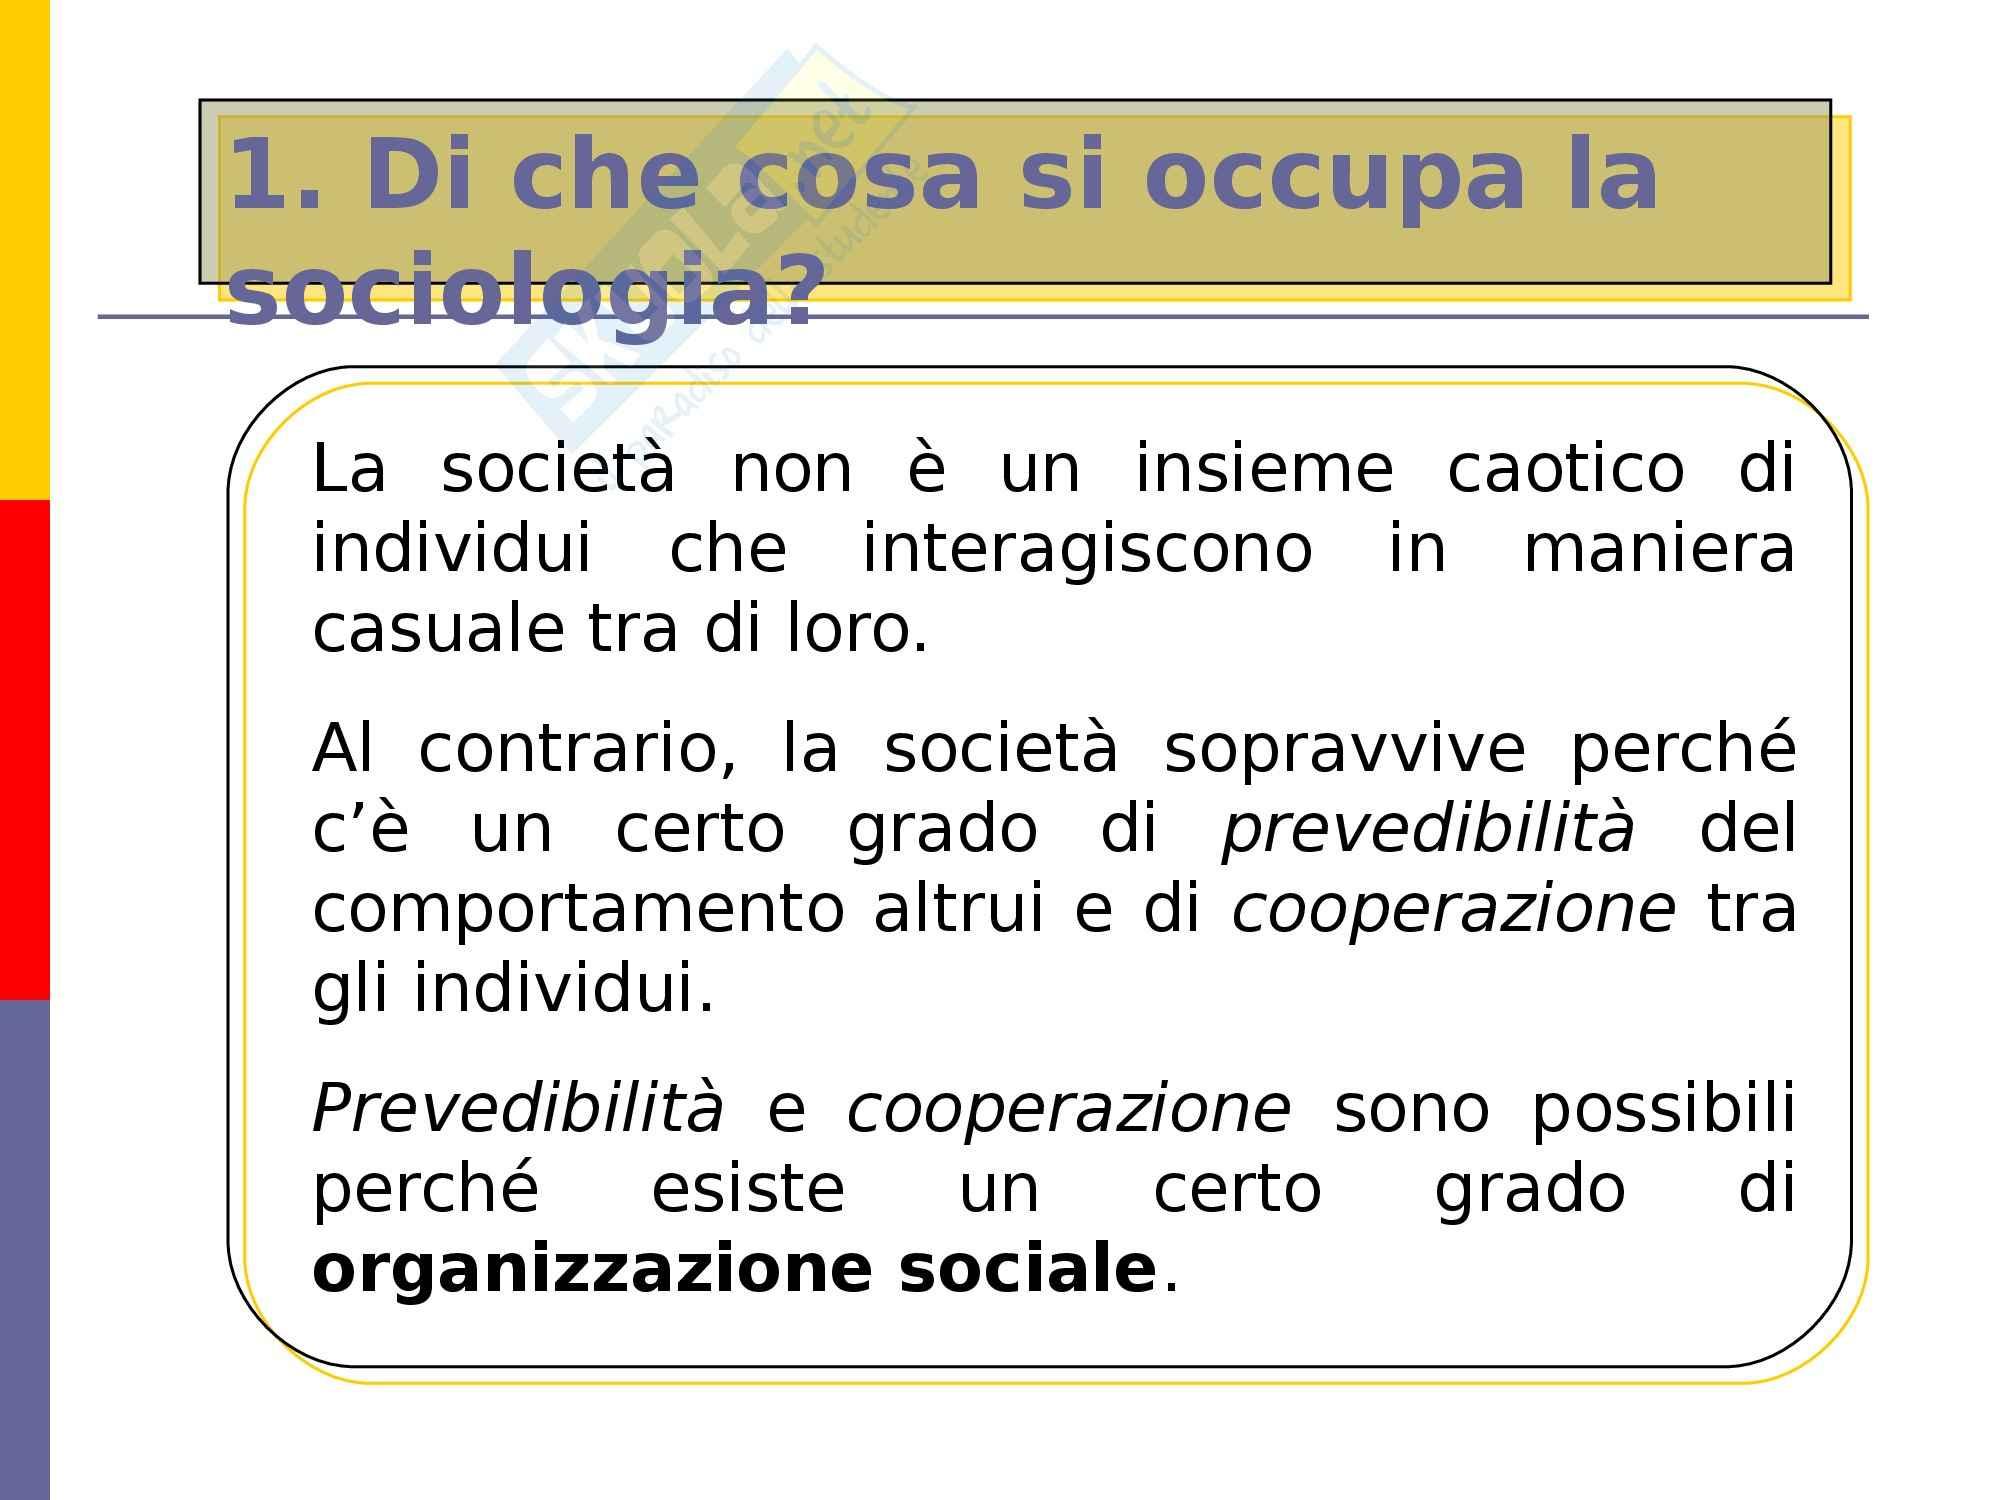 appunto L. Codara Sociologia urbana